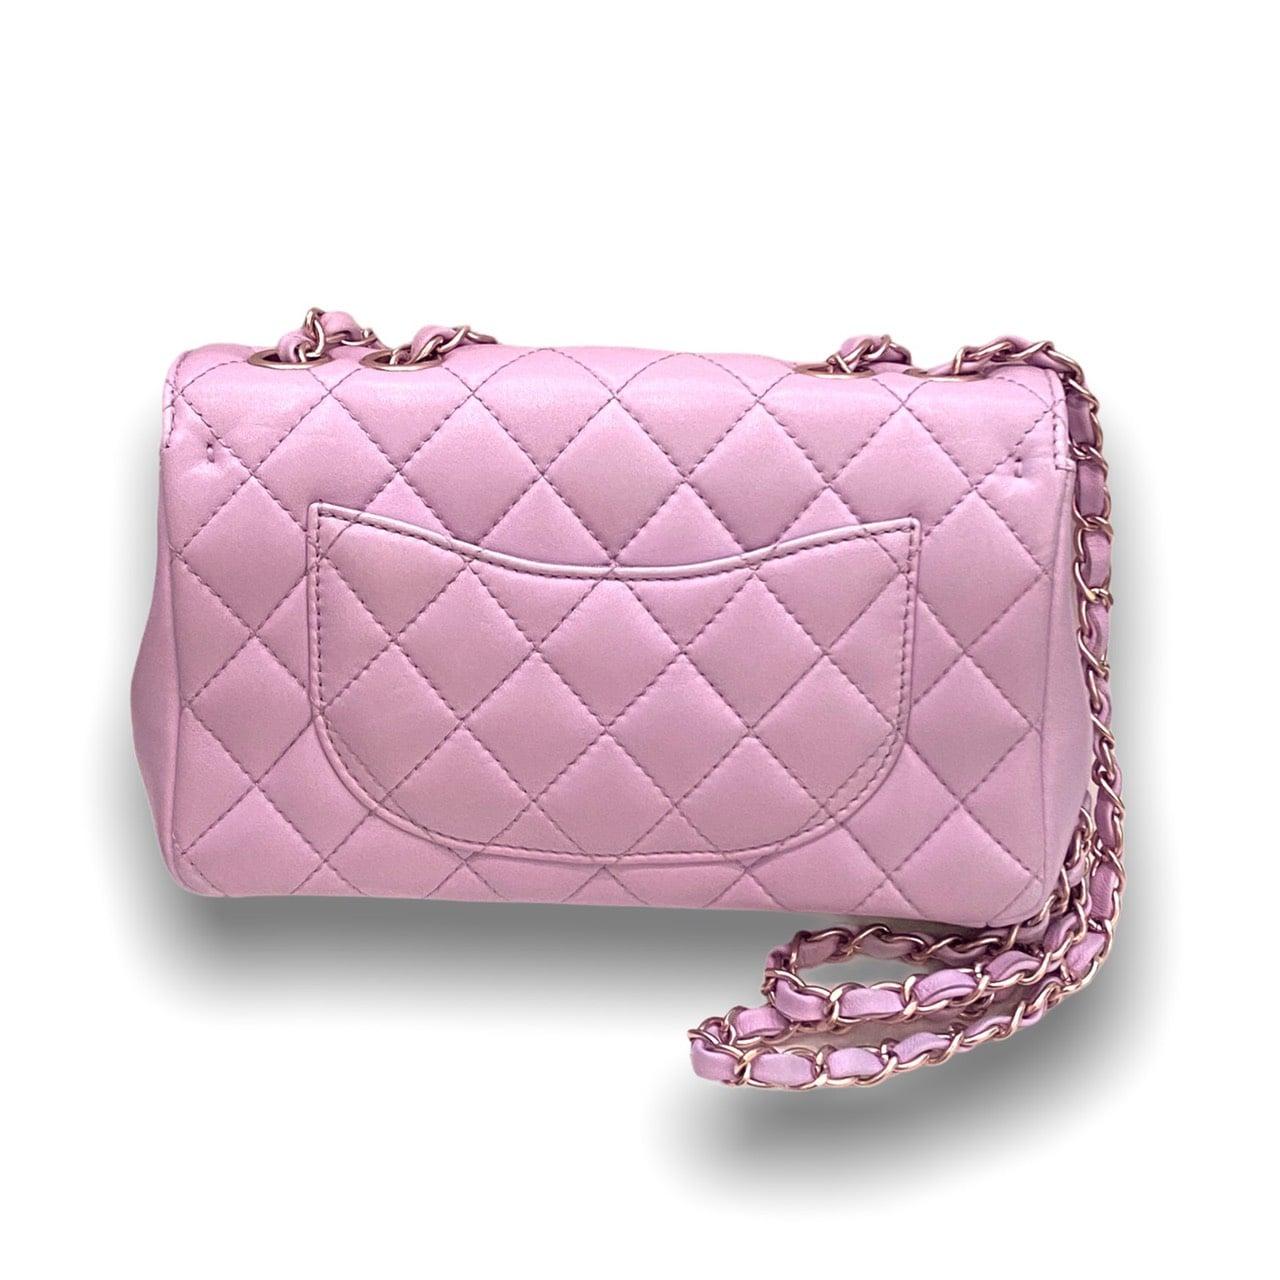 "Unused!Chanel seasonal Classic 9"" pink lambskin with gold hardware"